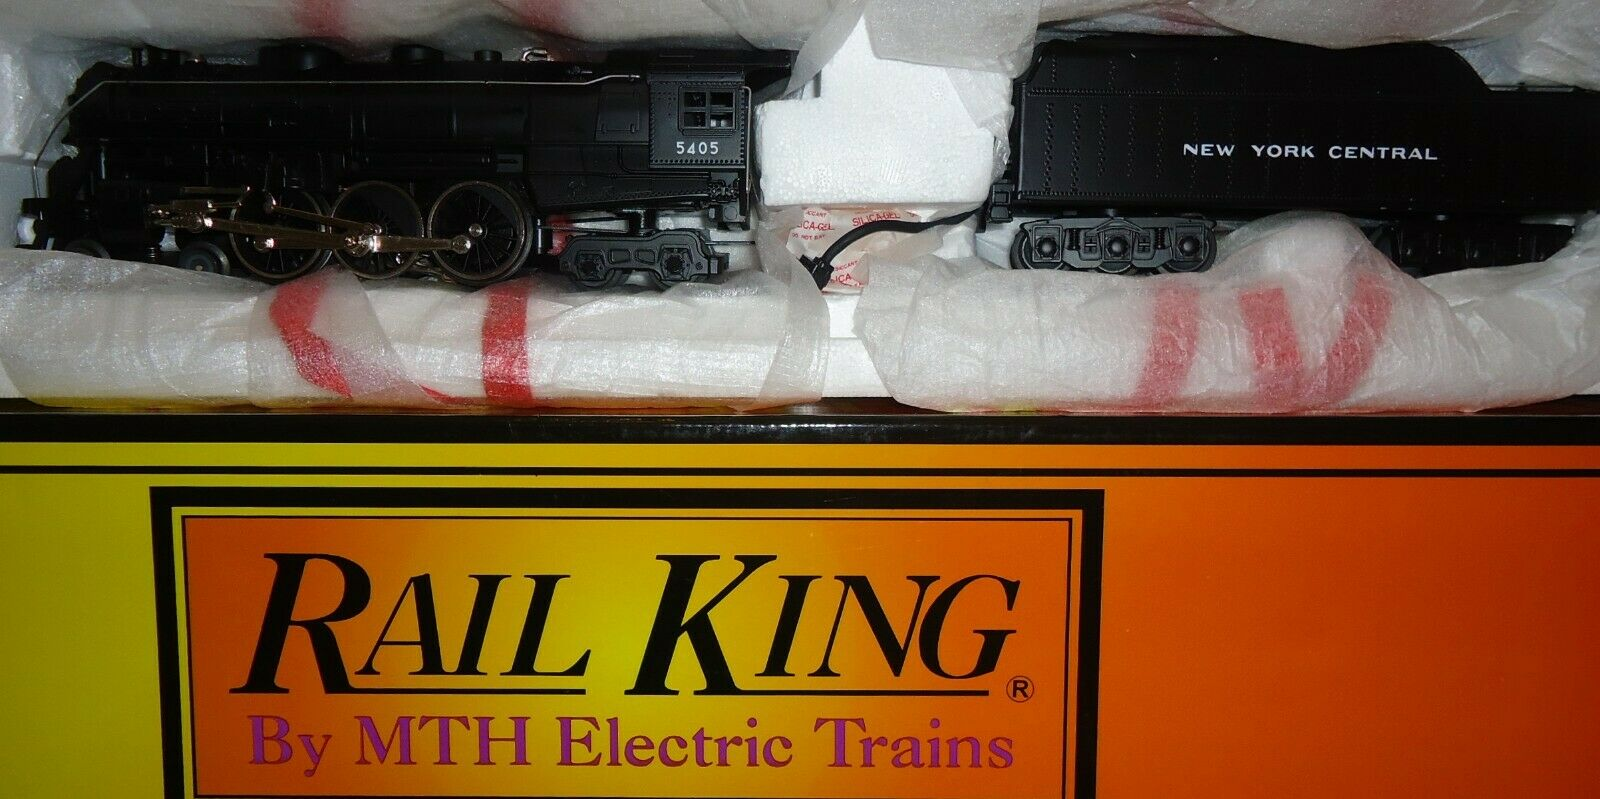 MTH rail king - - 4-6-4 Hudson-New York Central - 30-1121-1 Sonido Projoo